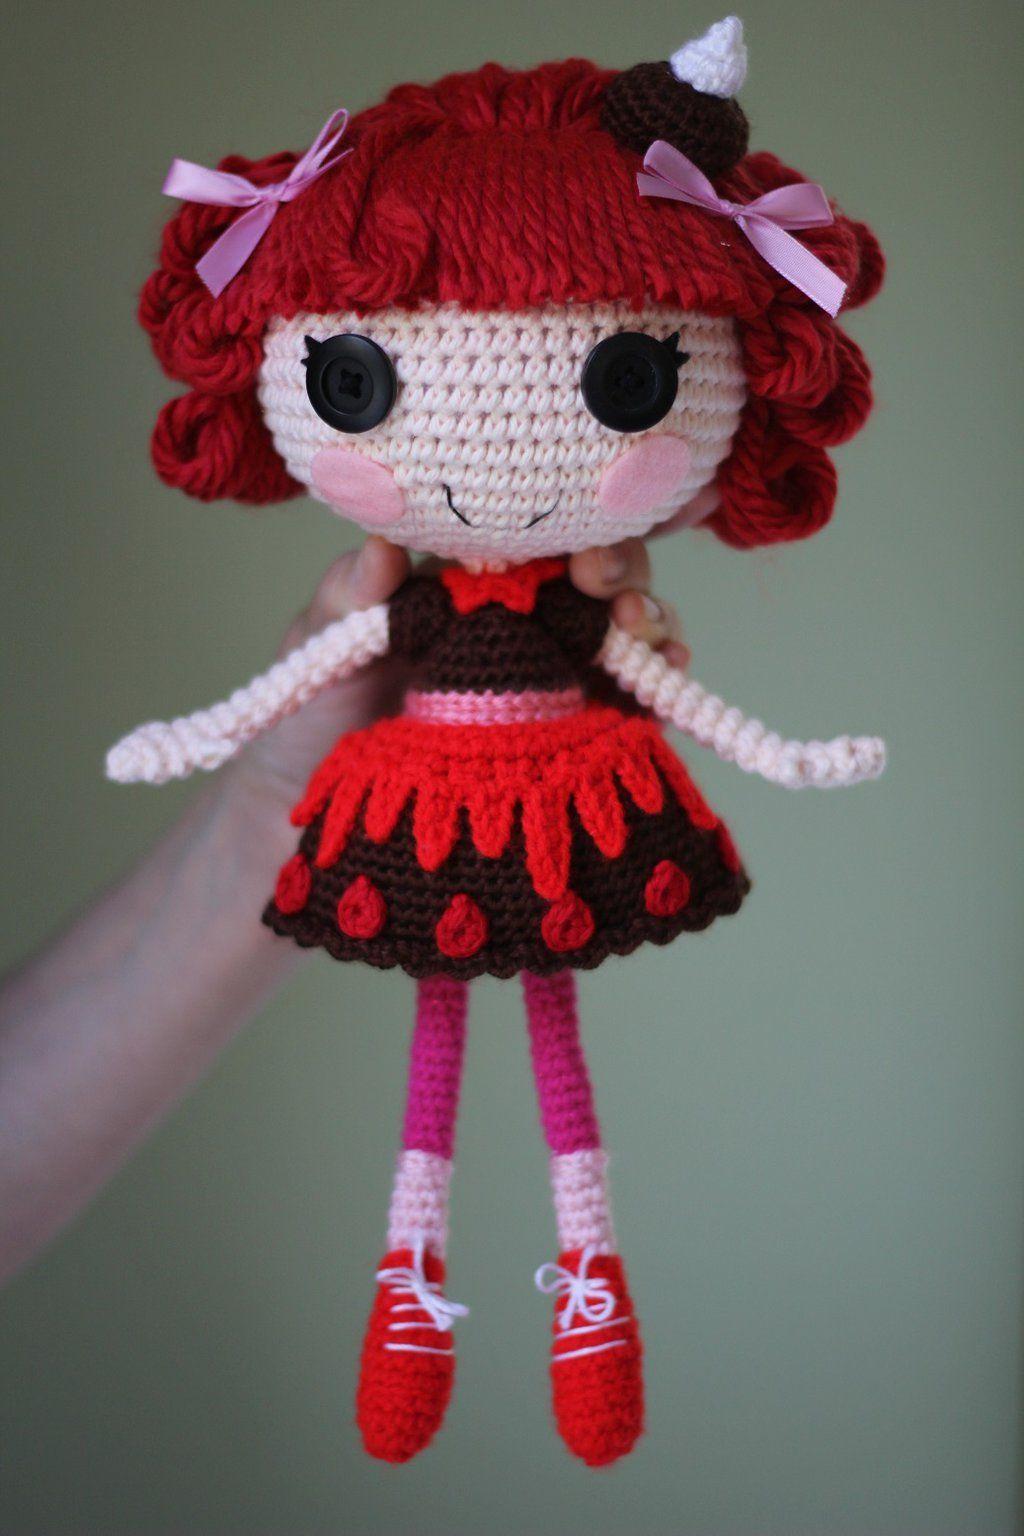 Amigarumi doll hair lalaloopsy choco whirl swirl amigurumi doll pattern lalaloopsy choco whirl swirl crochet by epickawaii on etsy bankloansurffo Gallery